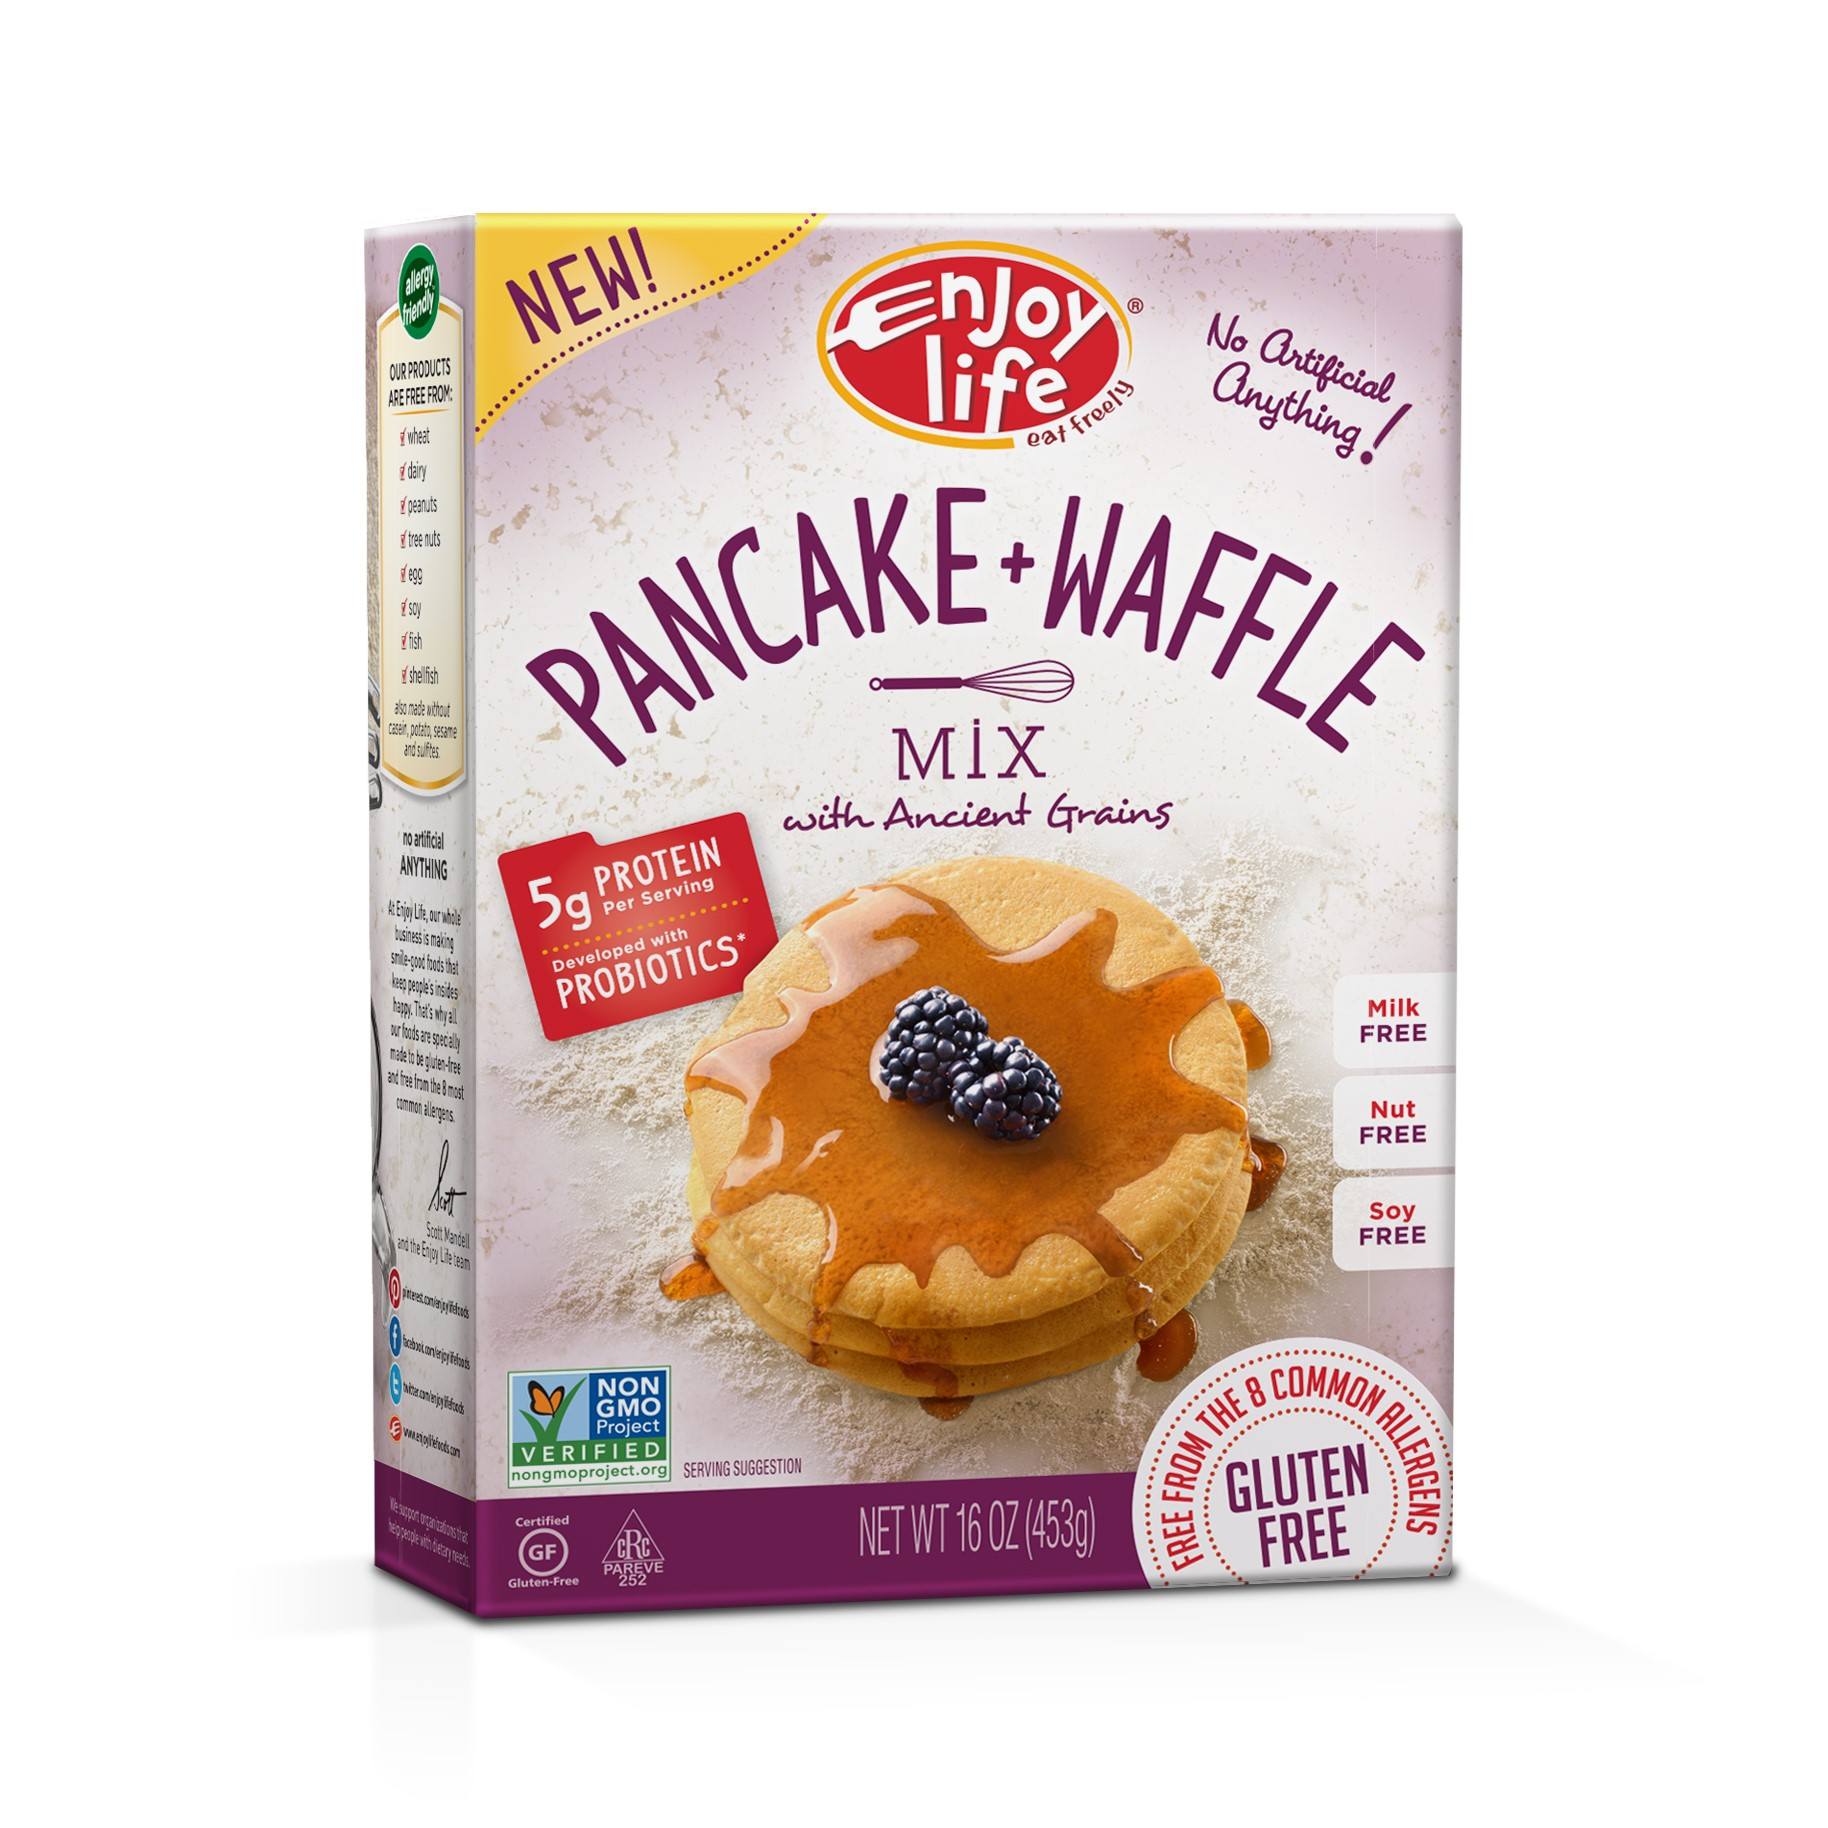 Enjoy Life Pancake + Waffle Mix, 16.0 OZ by Mondelez